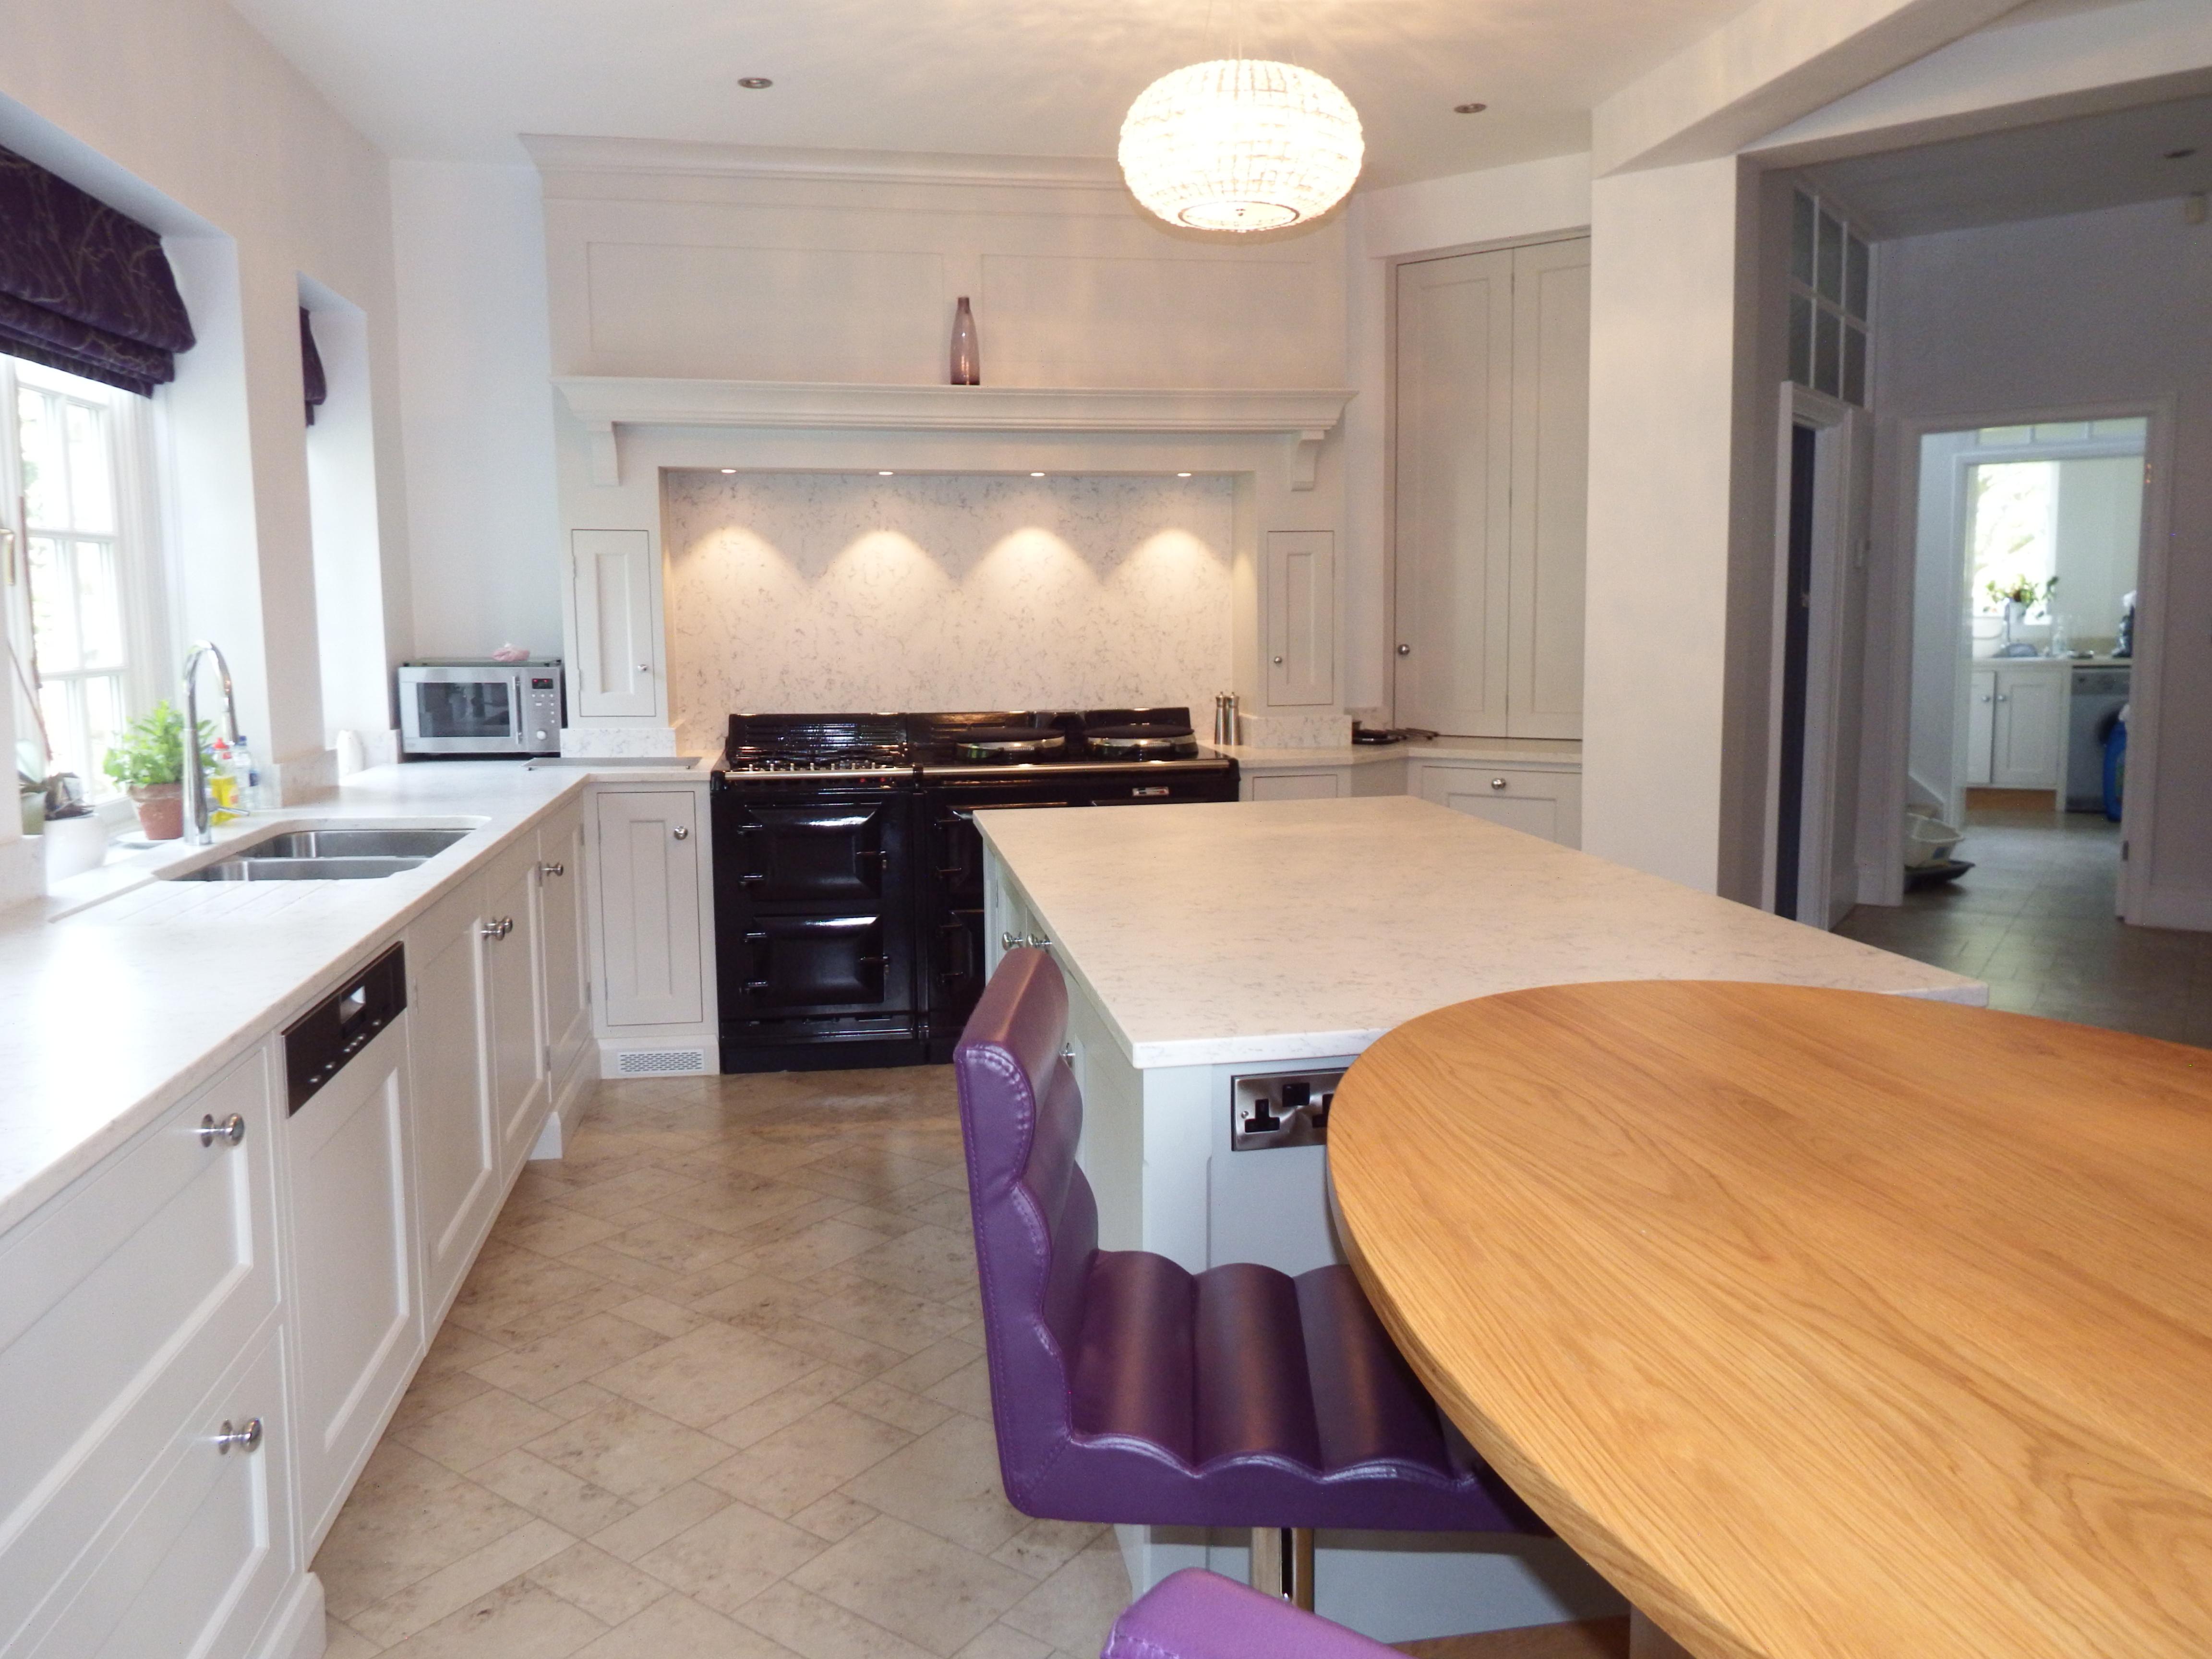 Harrogate kitchen design inglish design bespoke for Kitchen design yorkshire